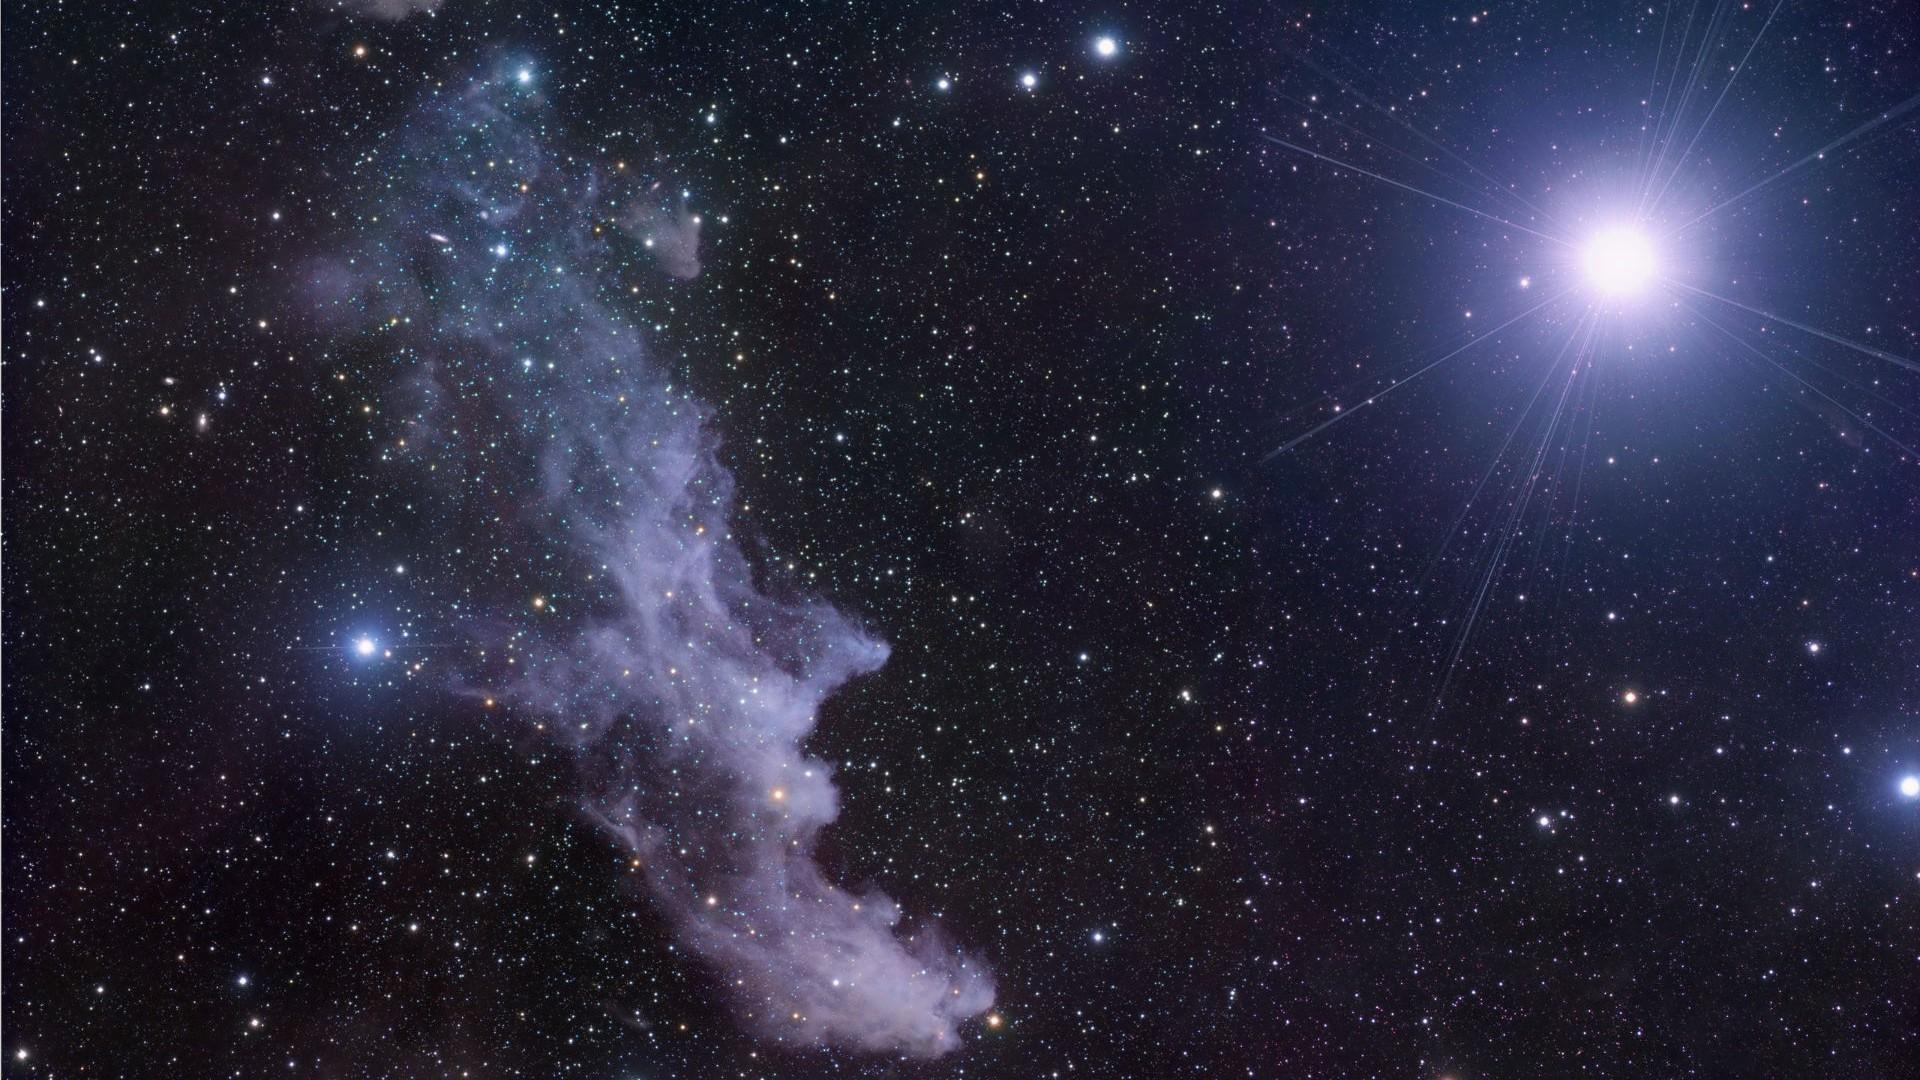 Universe-stars-high-resolution-wallpaper-1920×1080